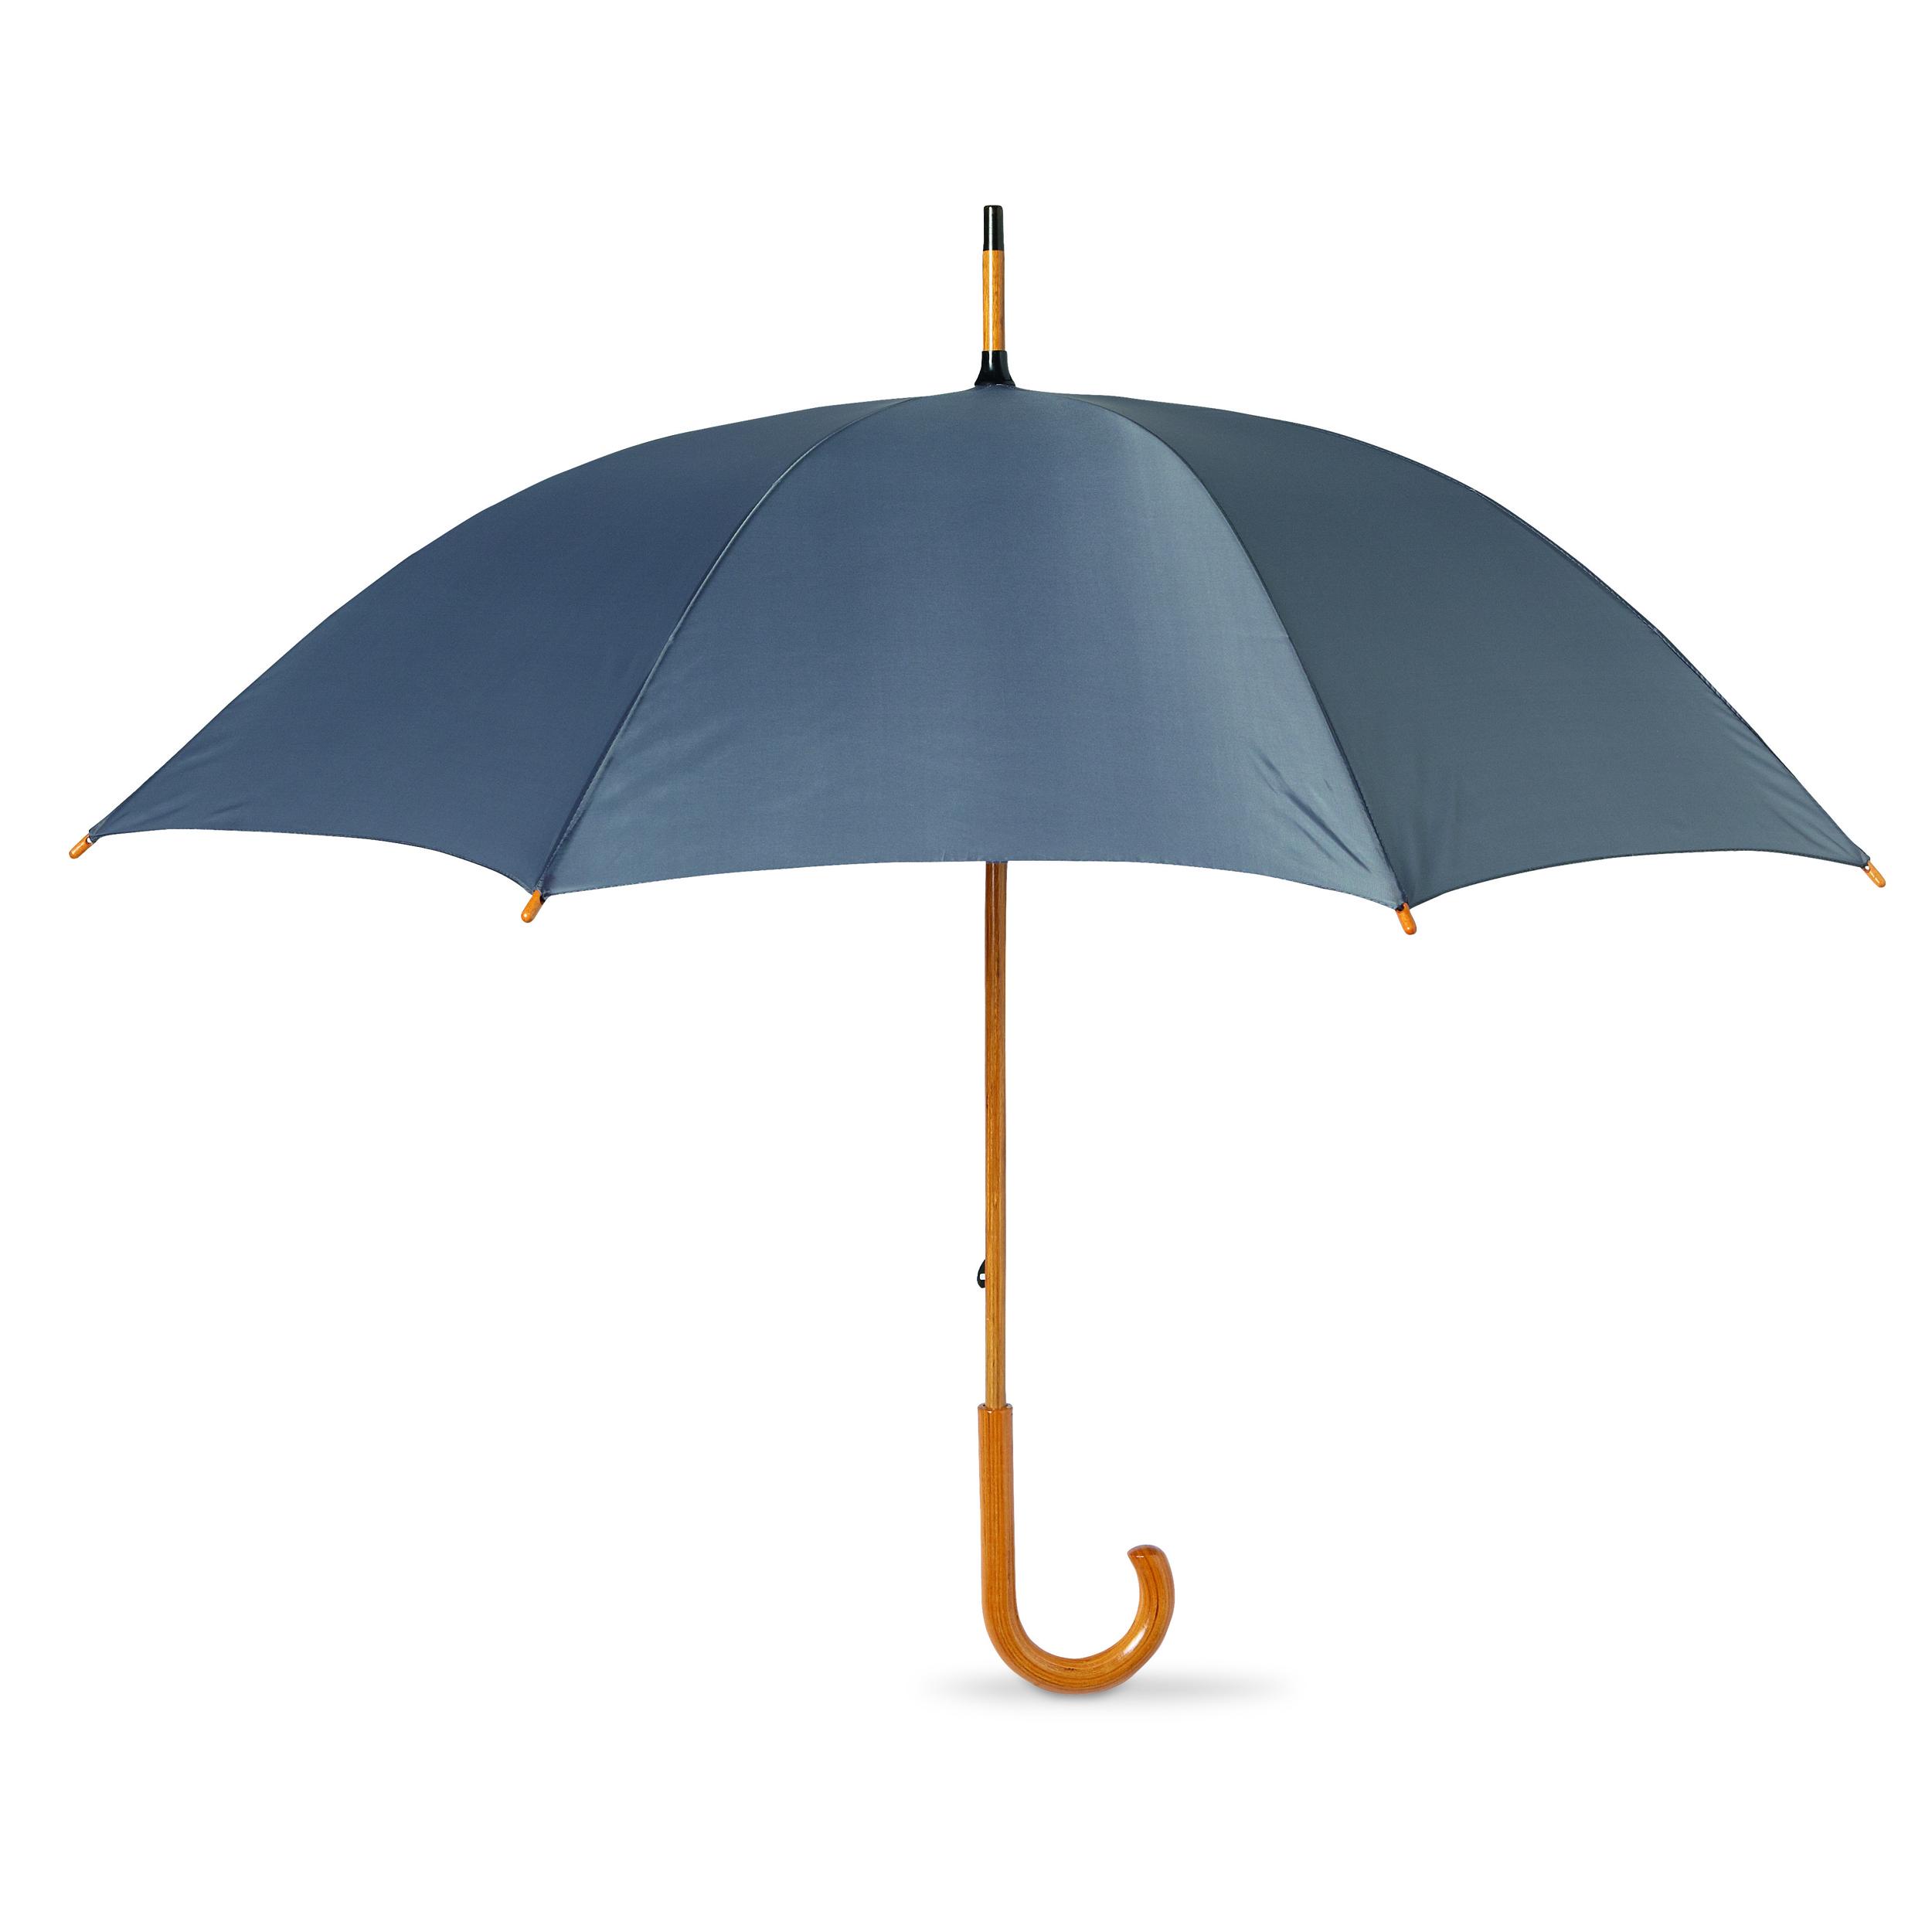 2-Stylish-Umbrellas-with-crooked-wooden-handle-Bride-Wedding-Groom-Walking